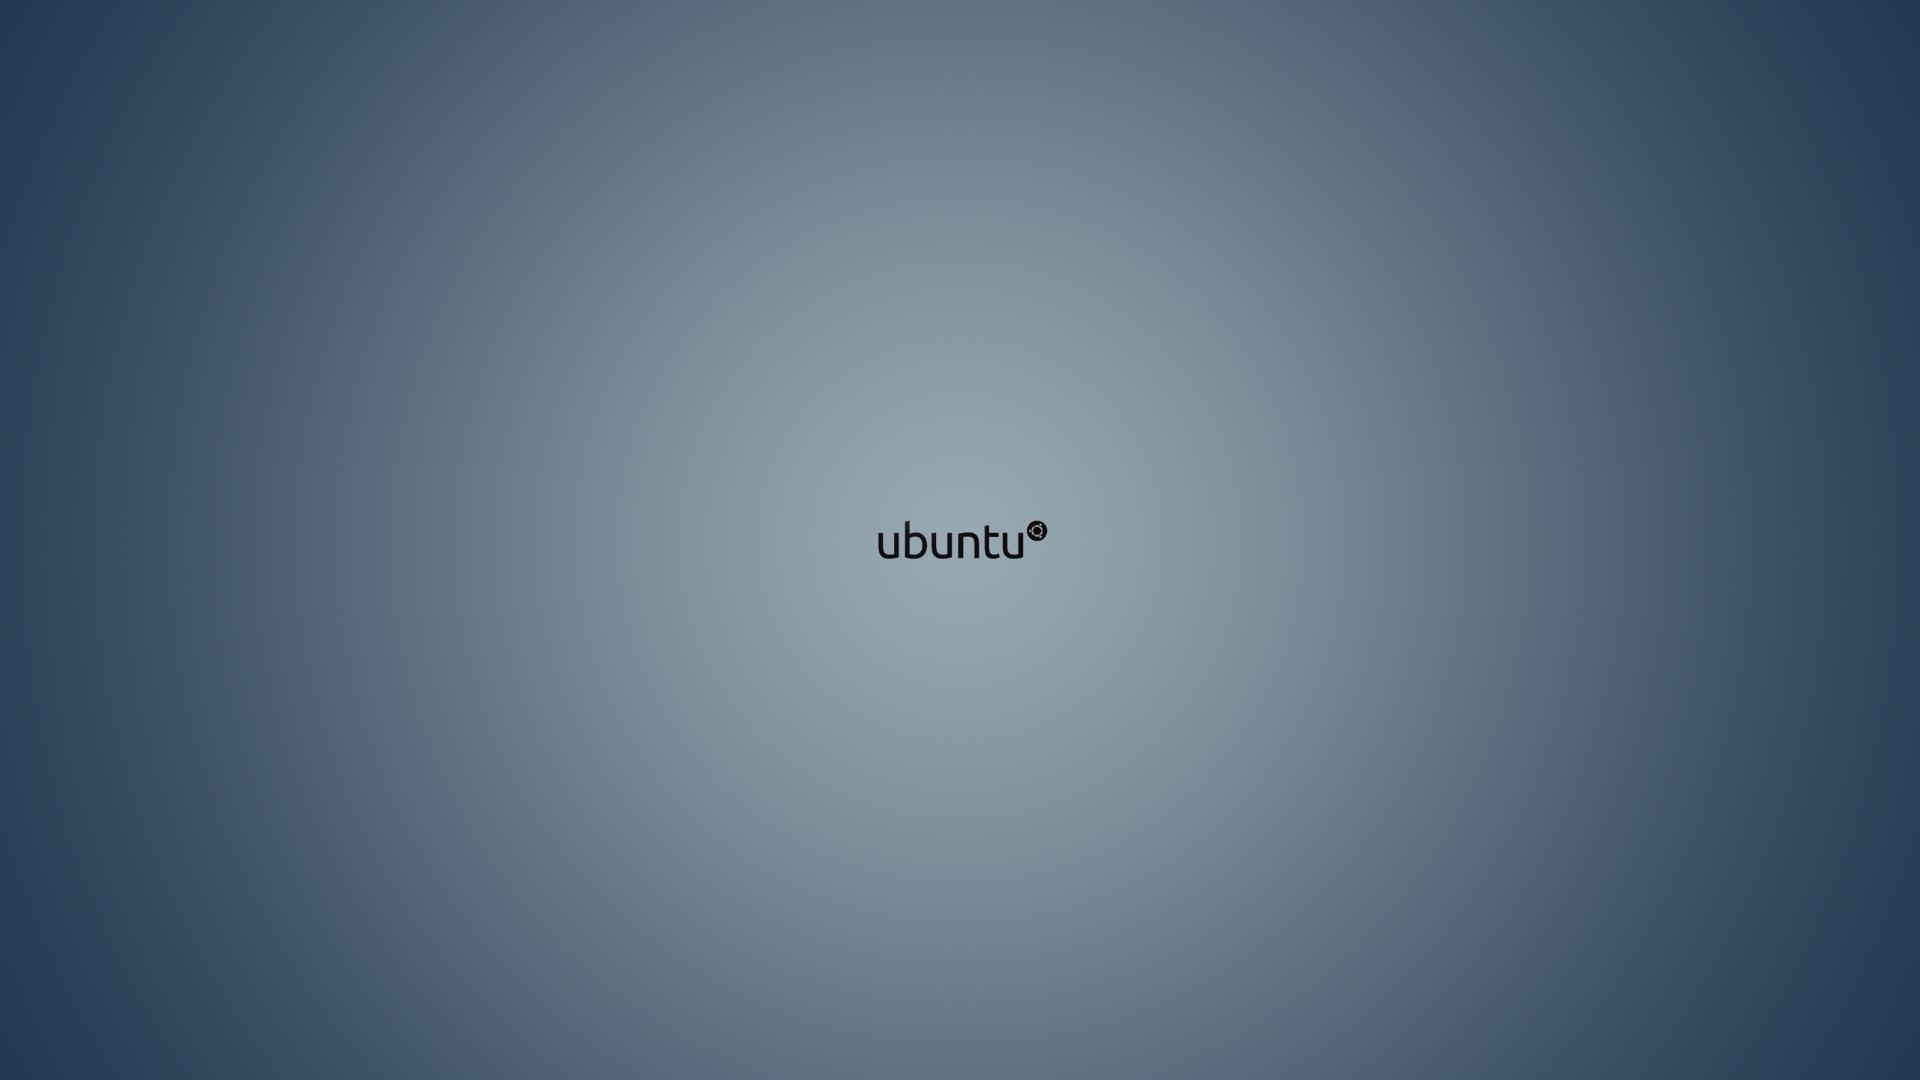 Ubuntu Simple Gradients by leonardomdq